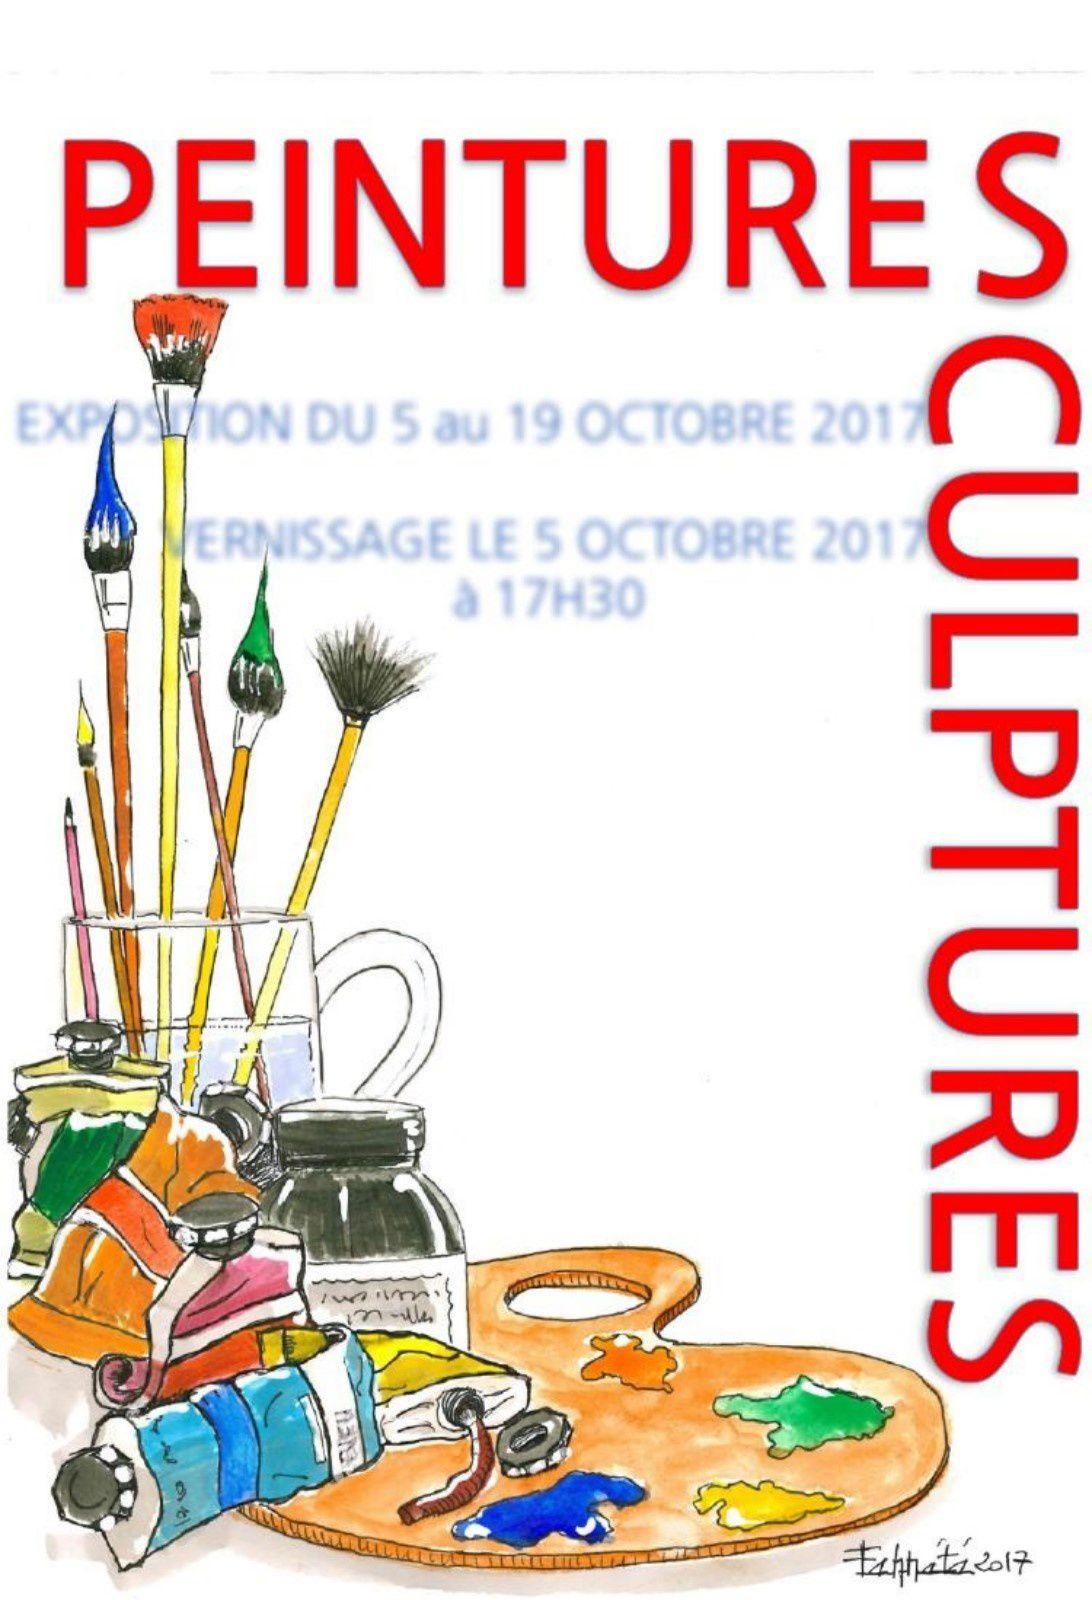 EXPO USM A MONACO: L' ARTISTE METFTAH RAOUF